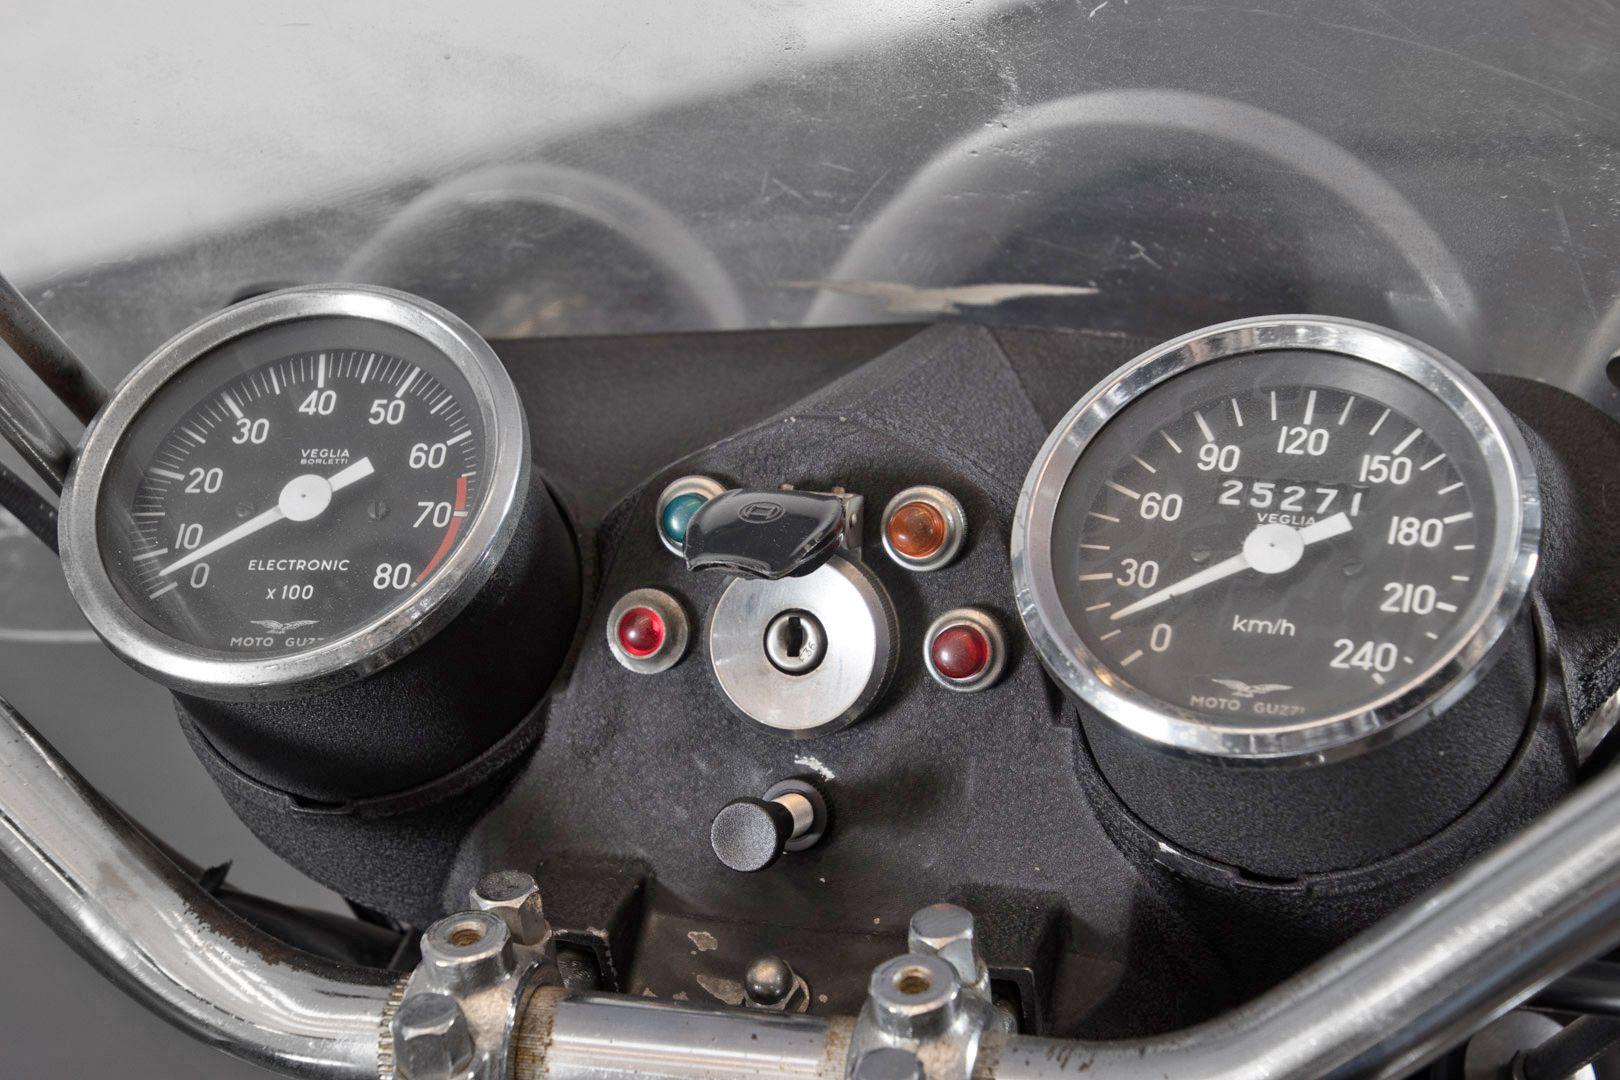 1973 Moto Guzzi VP V7 GT850 41838